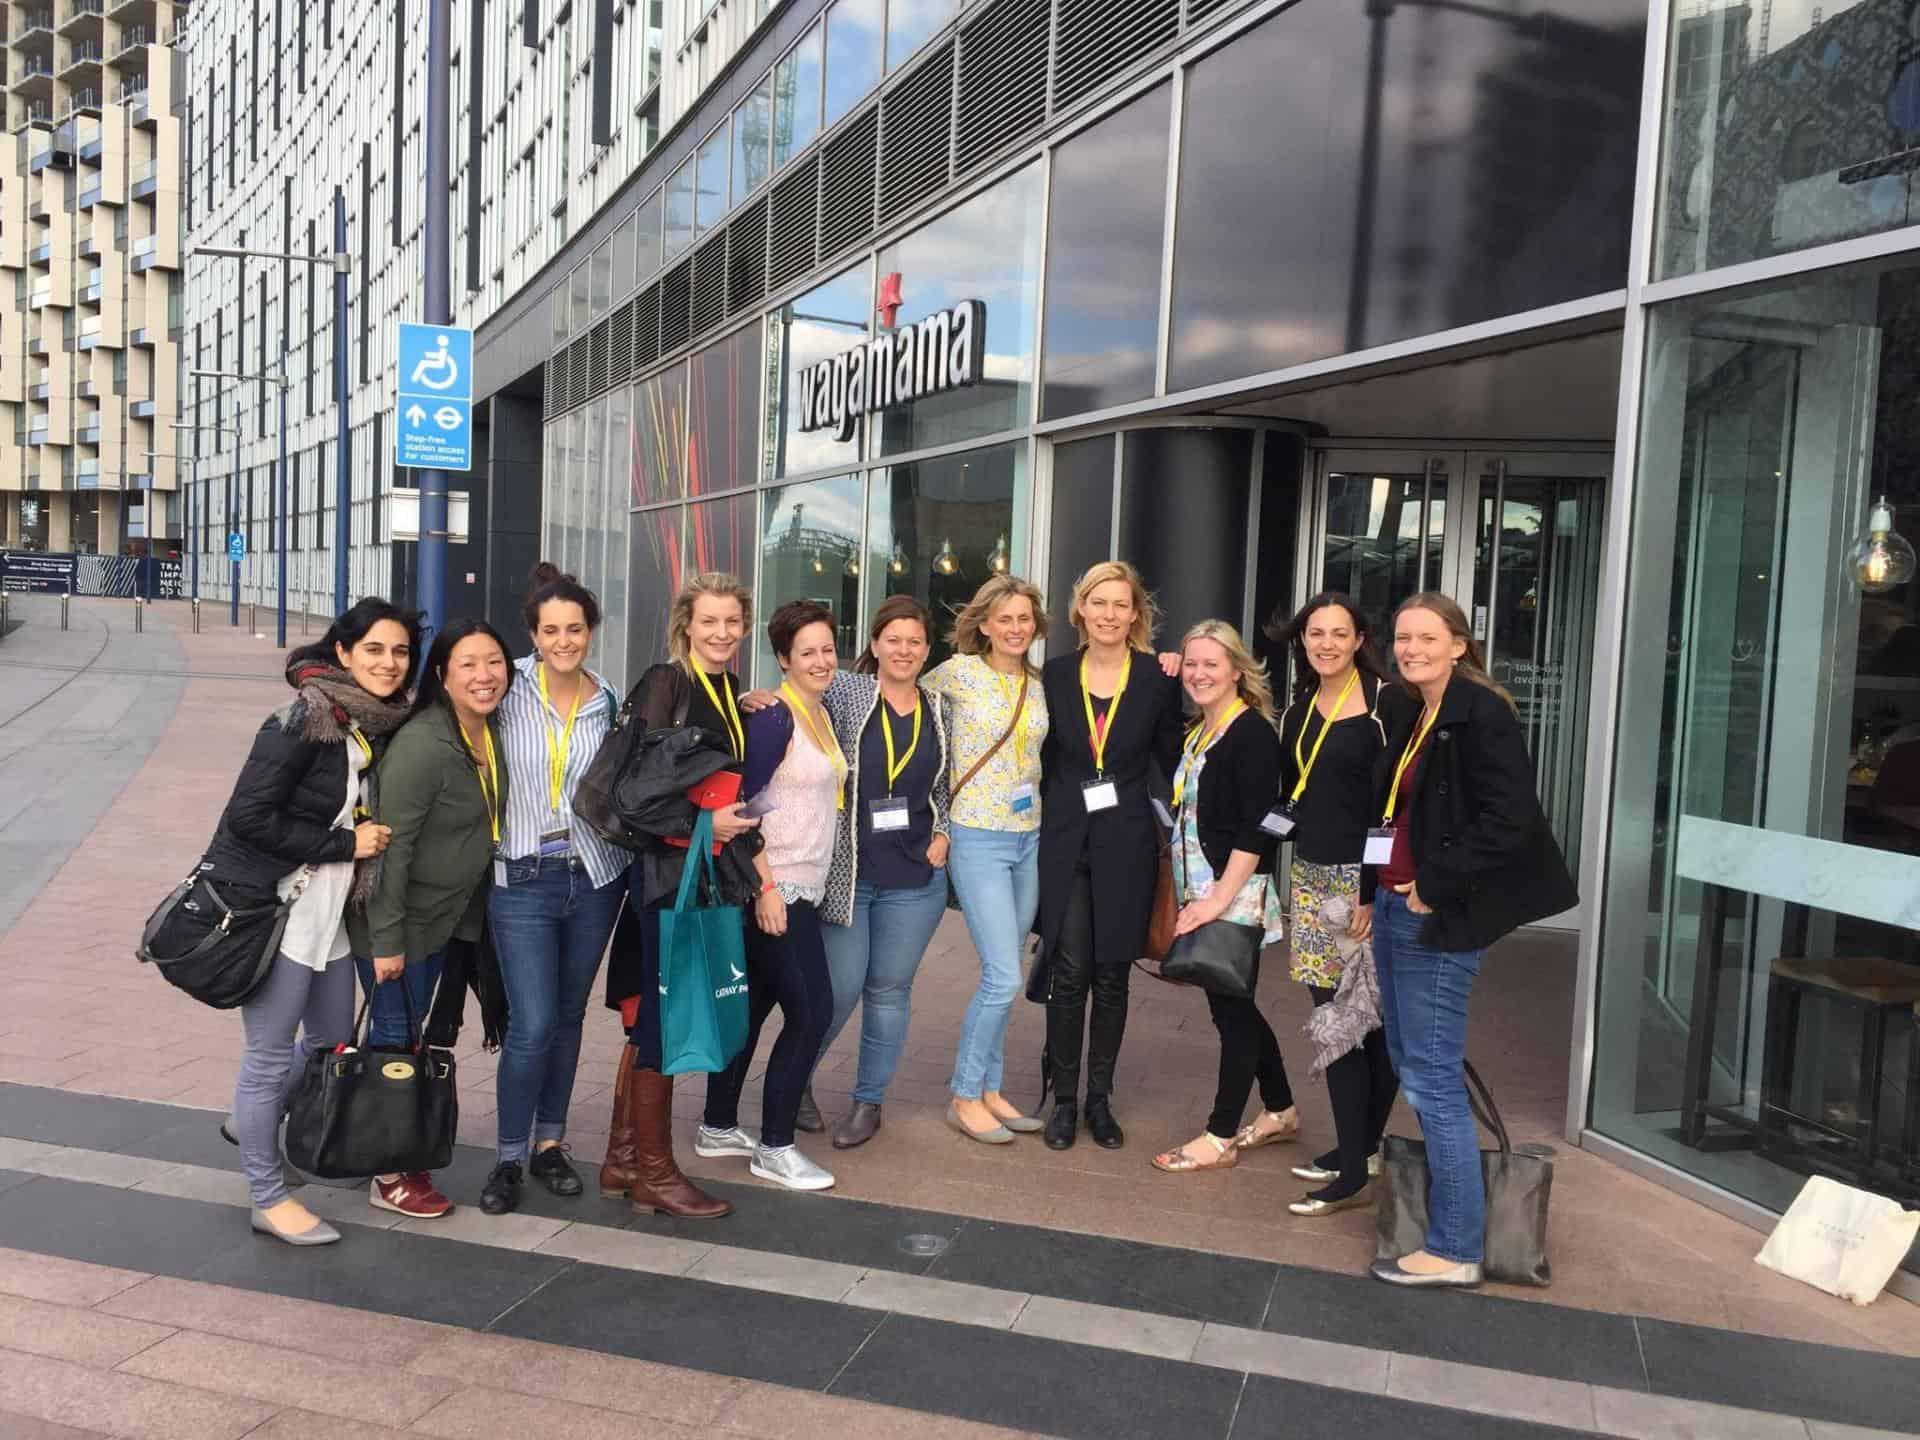 Traverse 2017 family travel bloggers